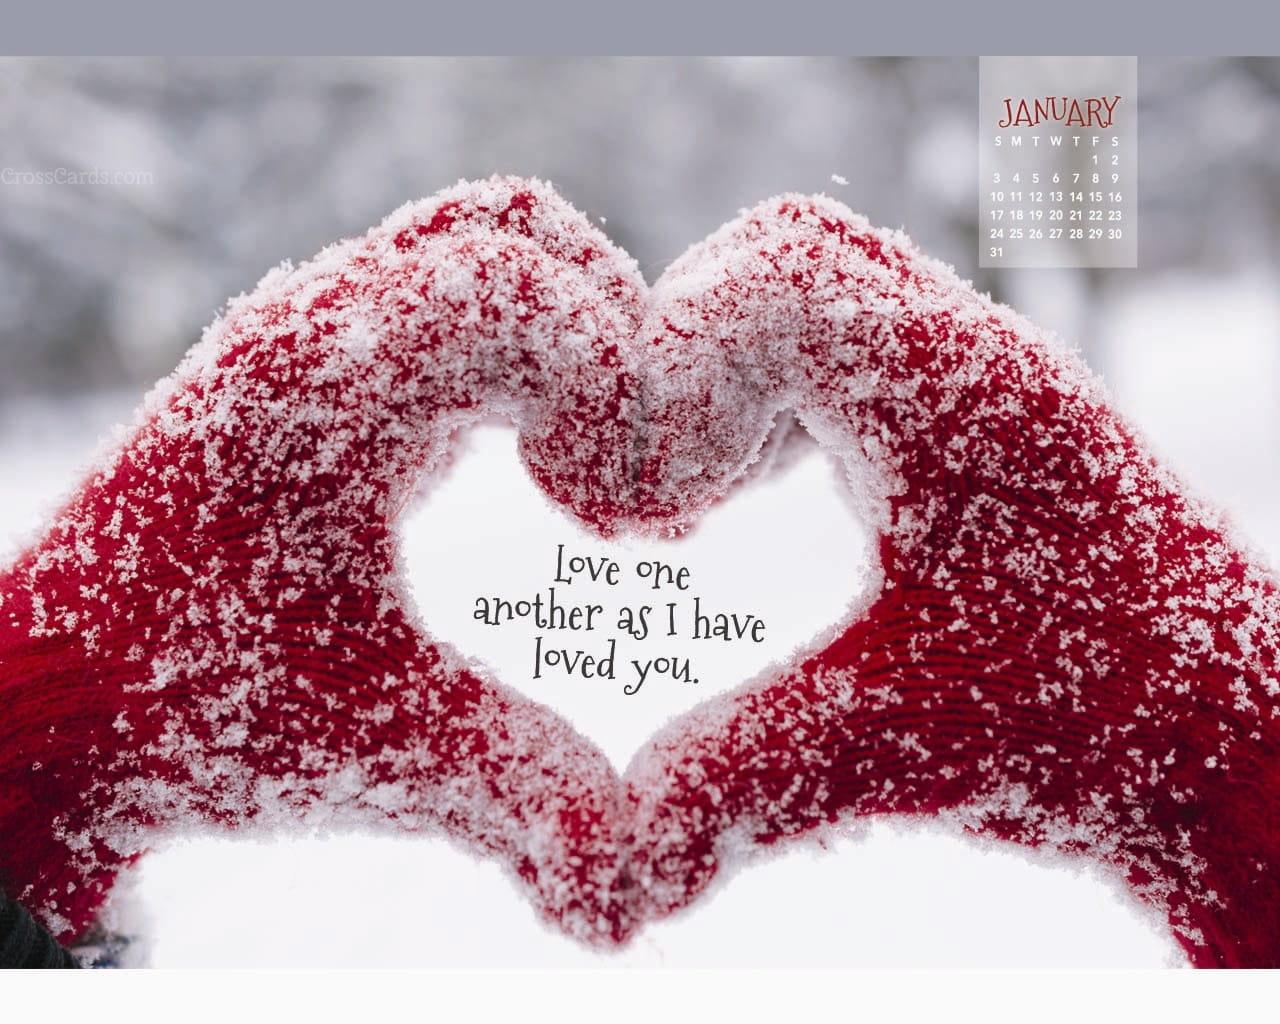 January 2016 Love One Another Desktop Calendar Free